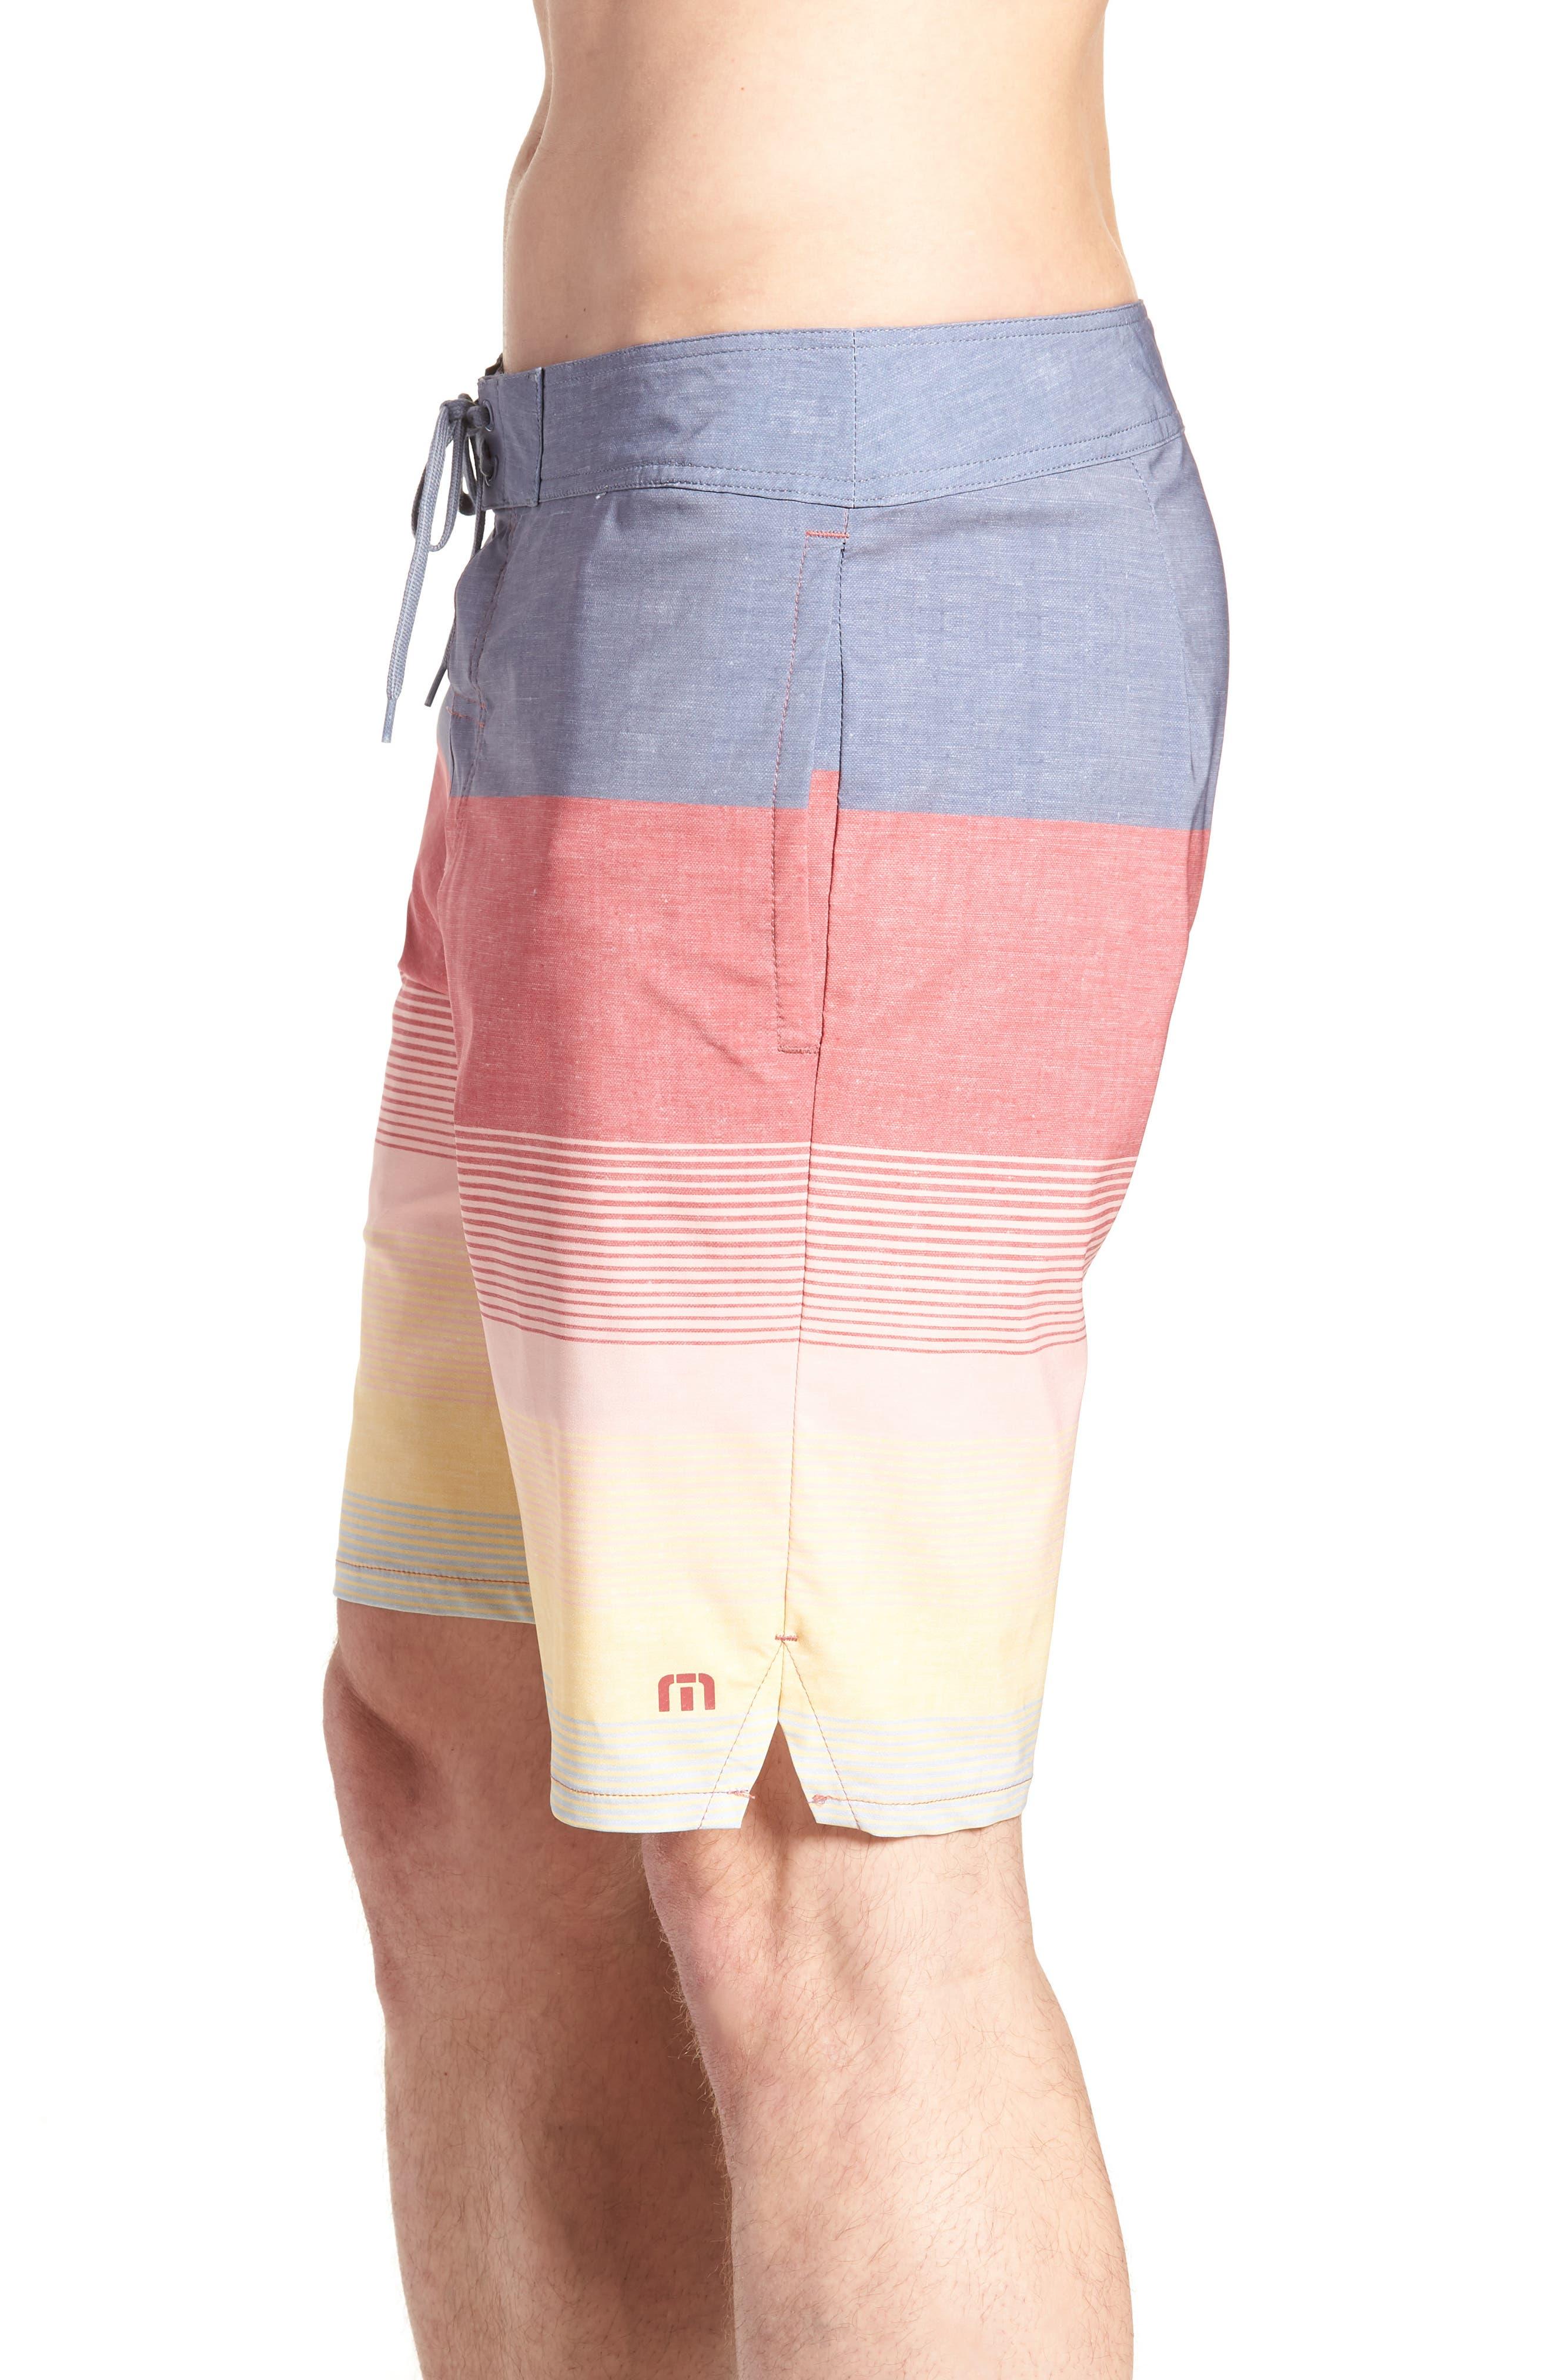 Seegrid Regular Fit Board Shorts,                             Alternate thumbnail 6, color,